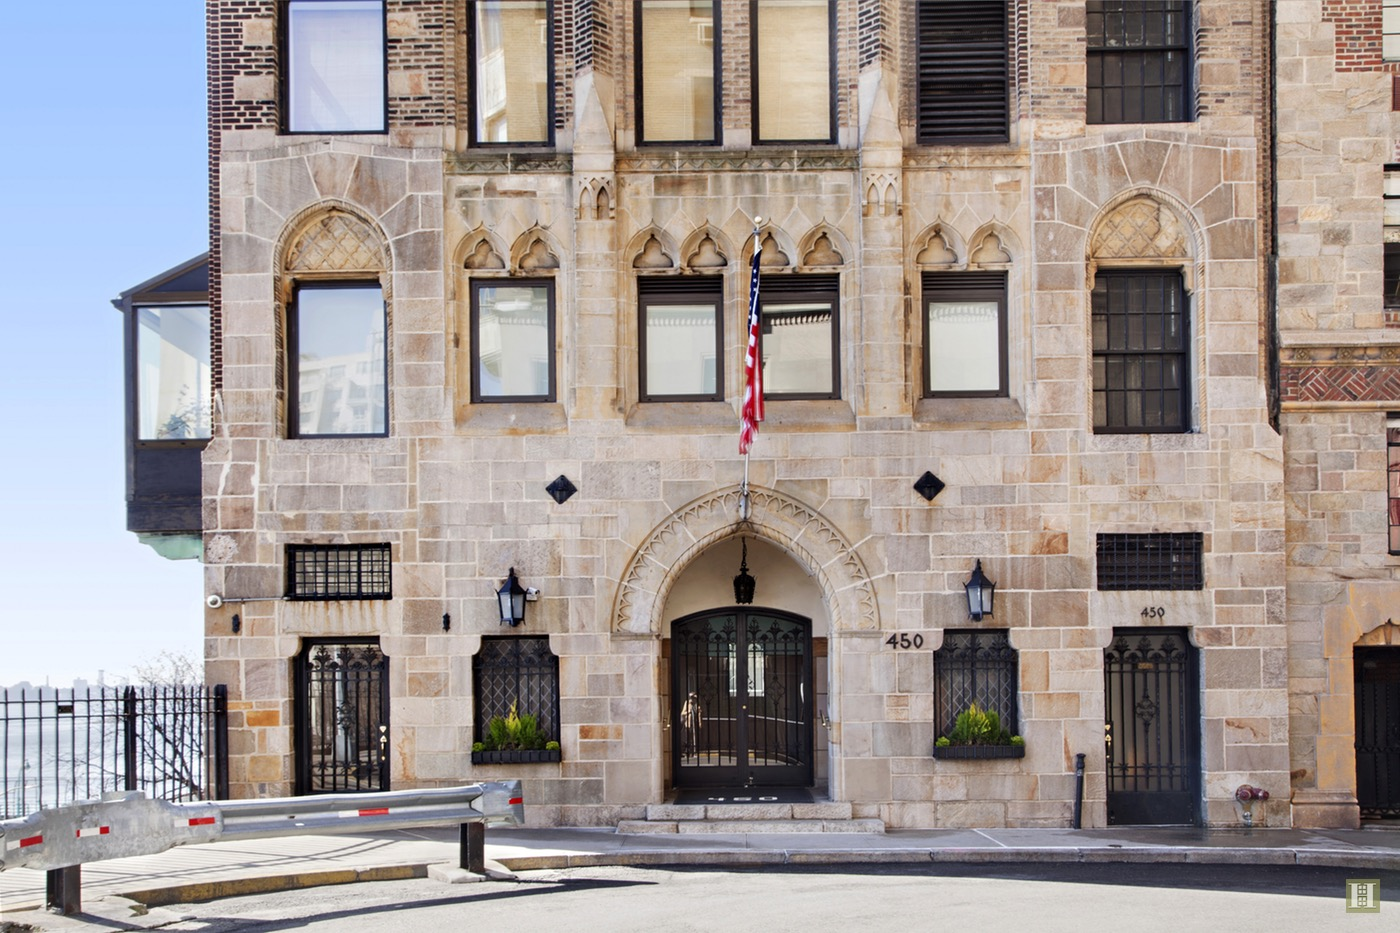 Greta-Garbo-New-York-Apartment-The-Campanile_16